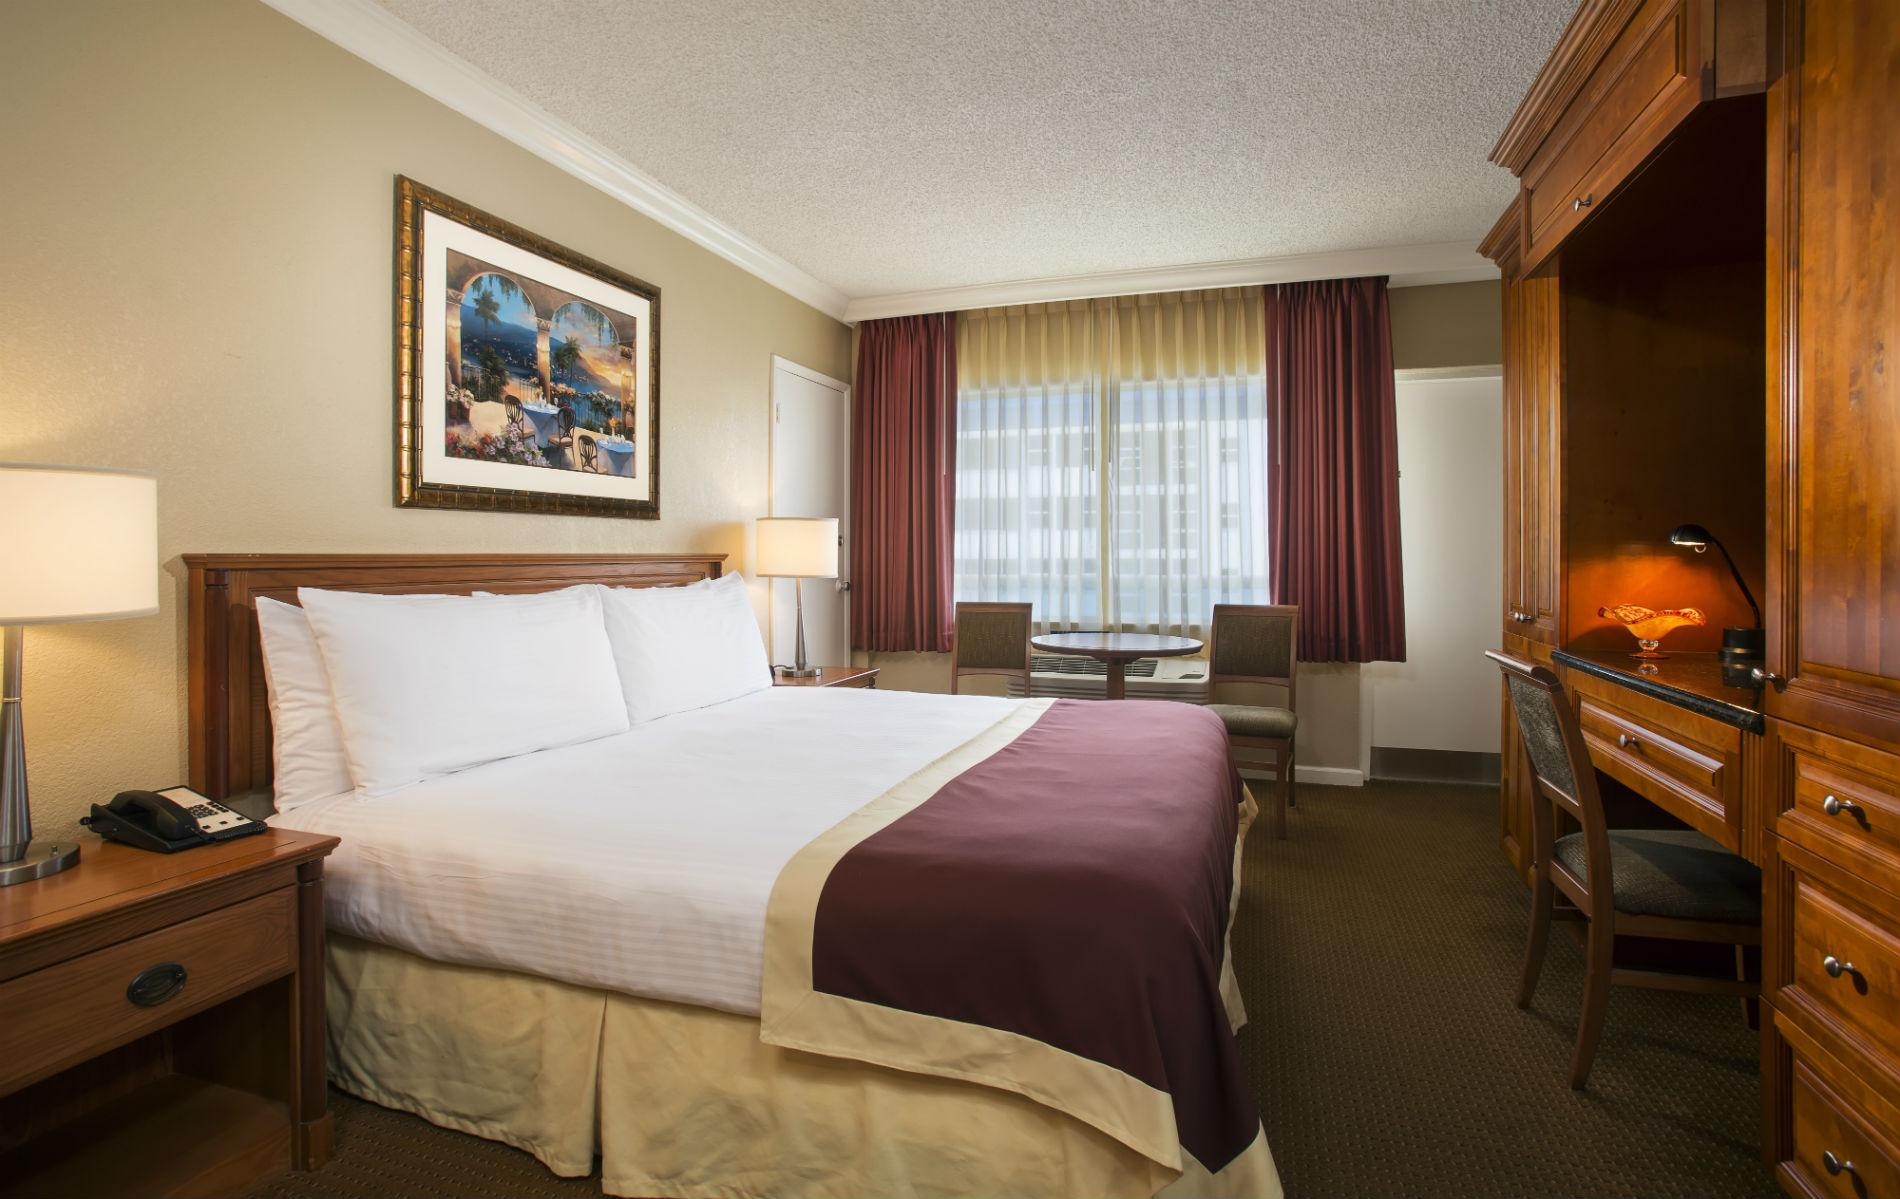 Chambre standard avec très grand lit